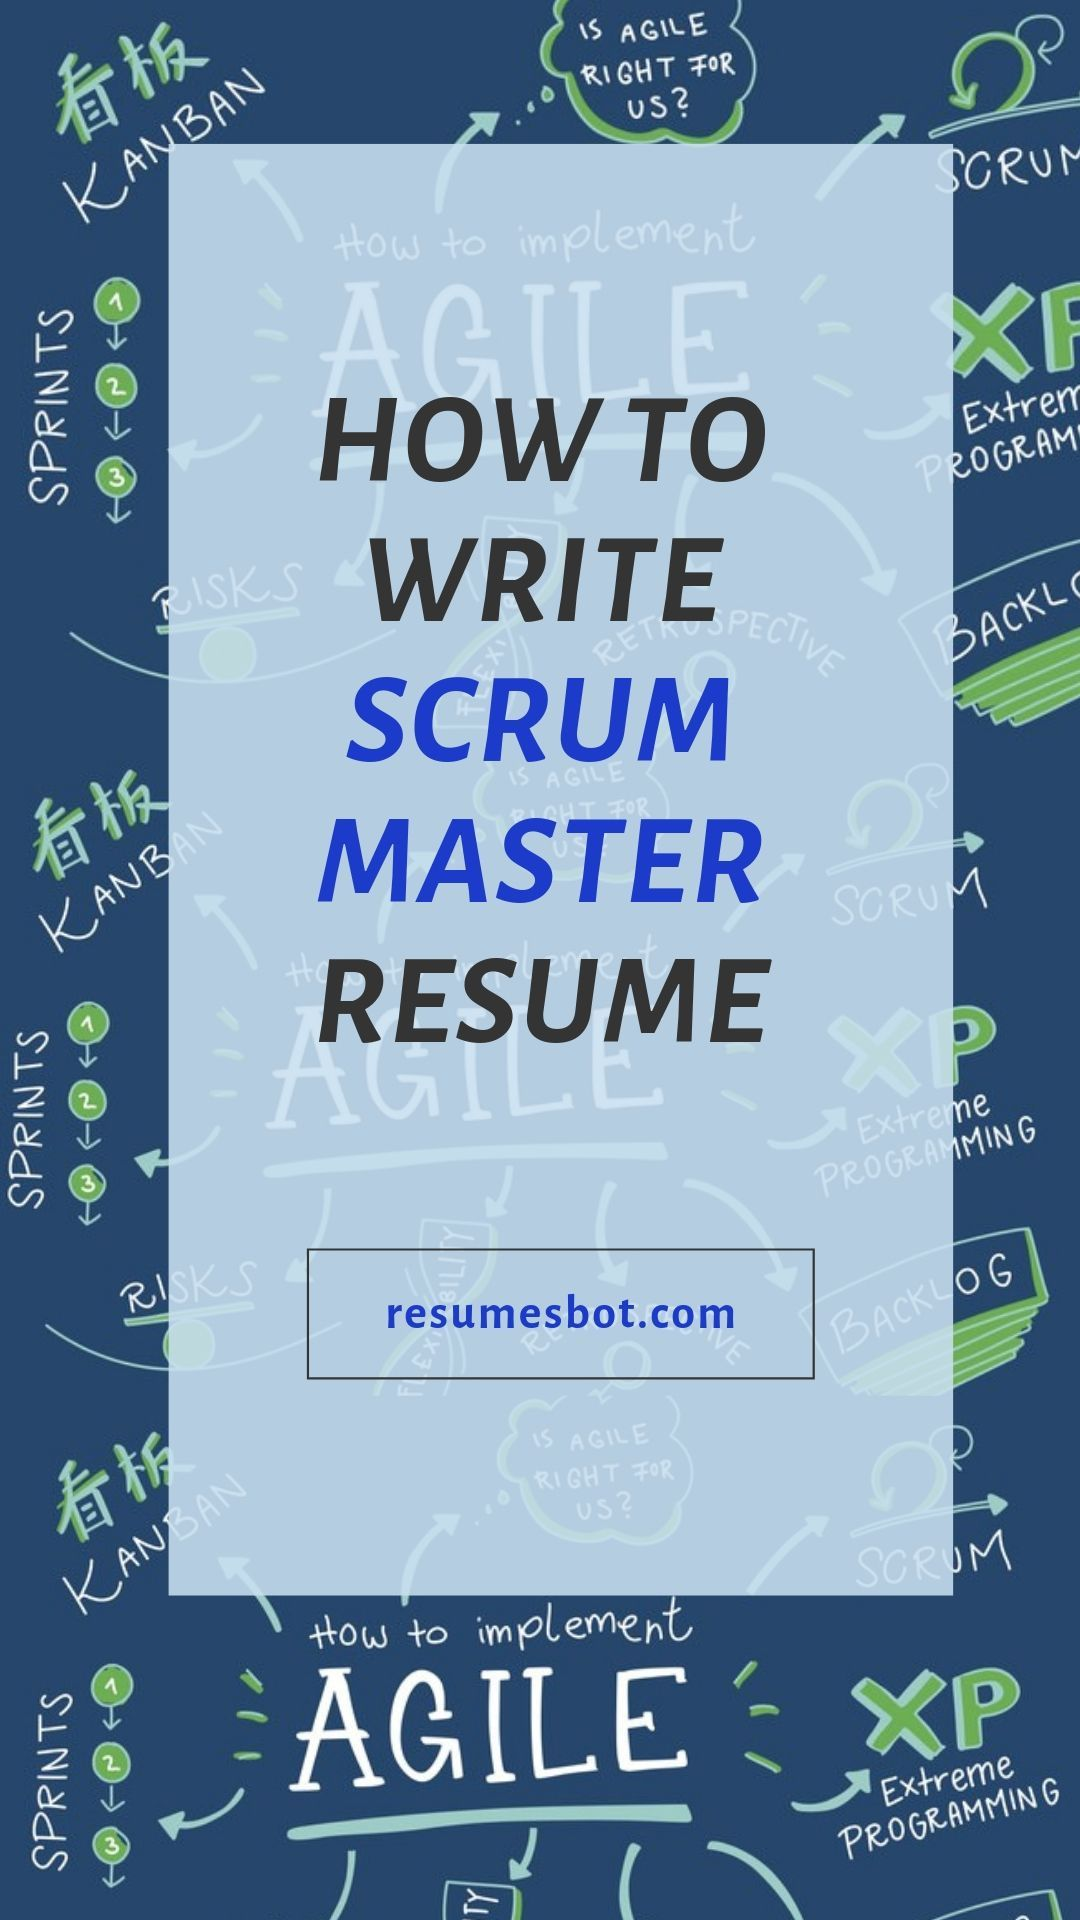 Scrum Master Resume Samples Templates Pdf Doc 2021 Scrum Master Resumes Bot Scrum Master Resume Template Examples Resume Examples